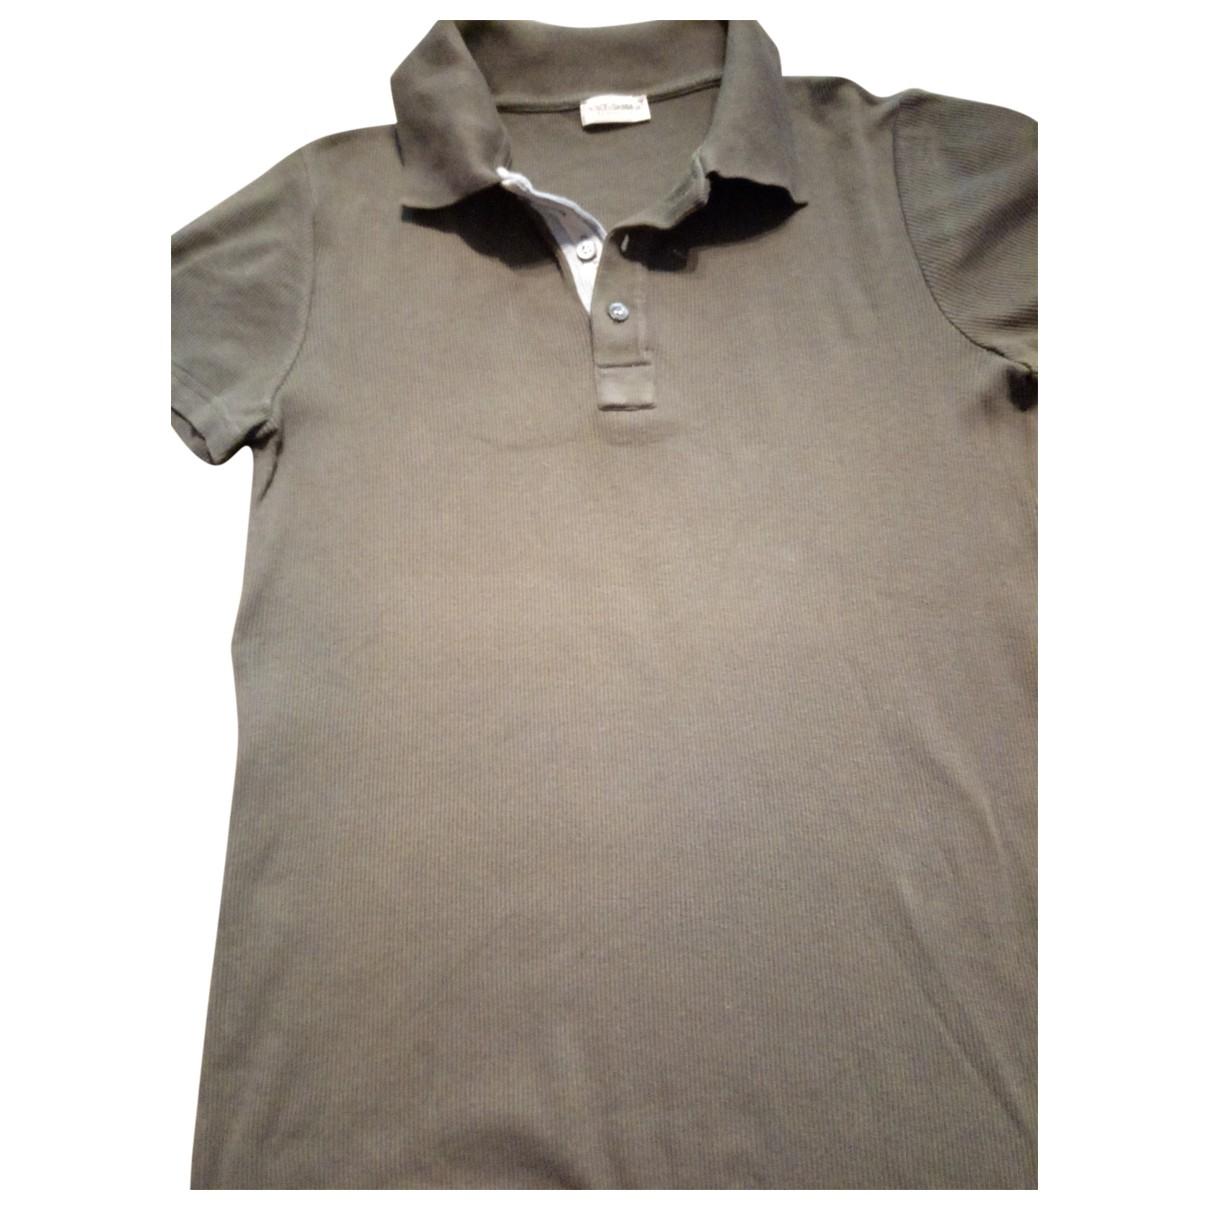 Dolce & Gabbana \N Green Cotton Polo shirts for Men S International